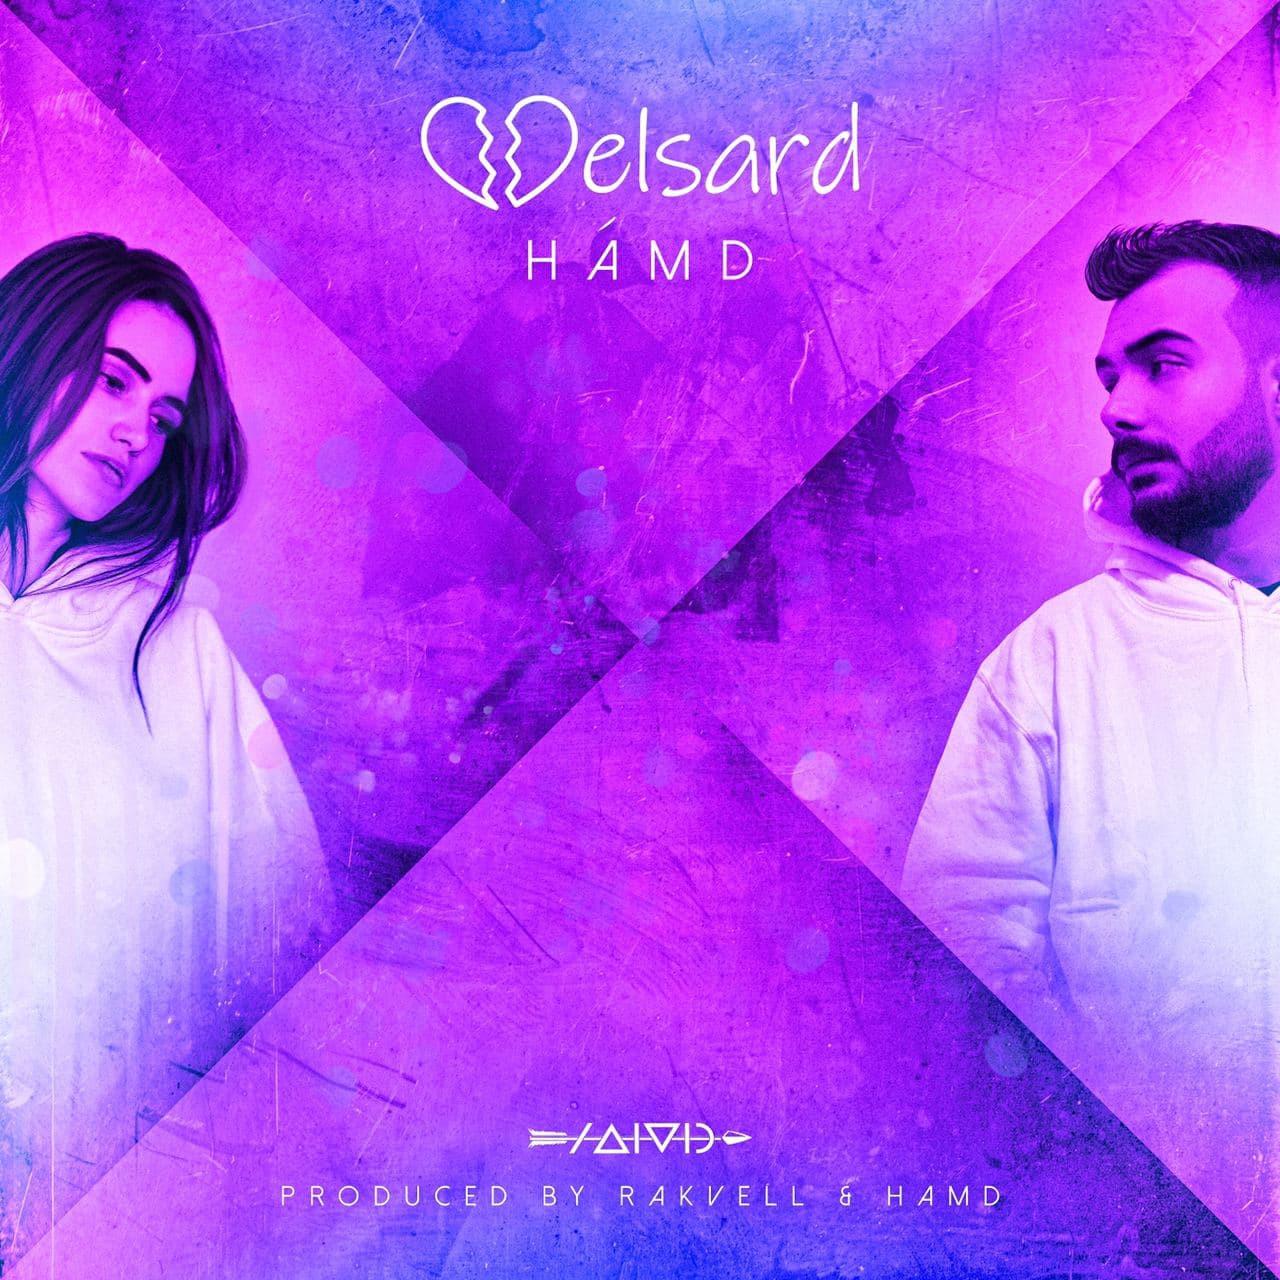 Hamd - Delsard